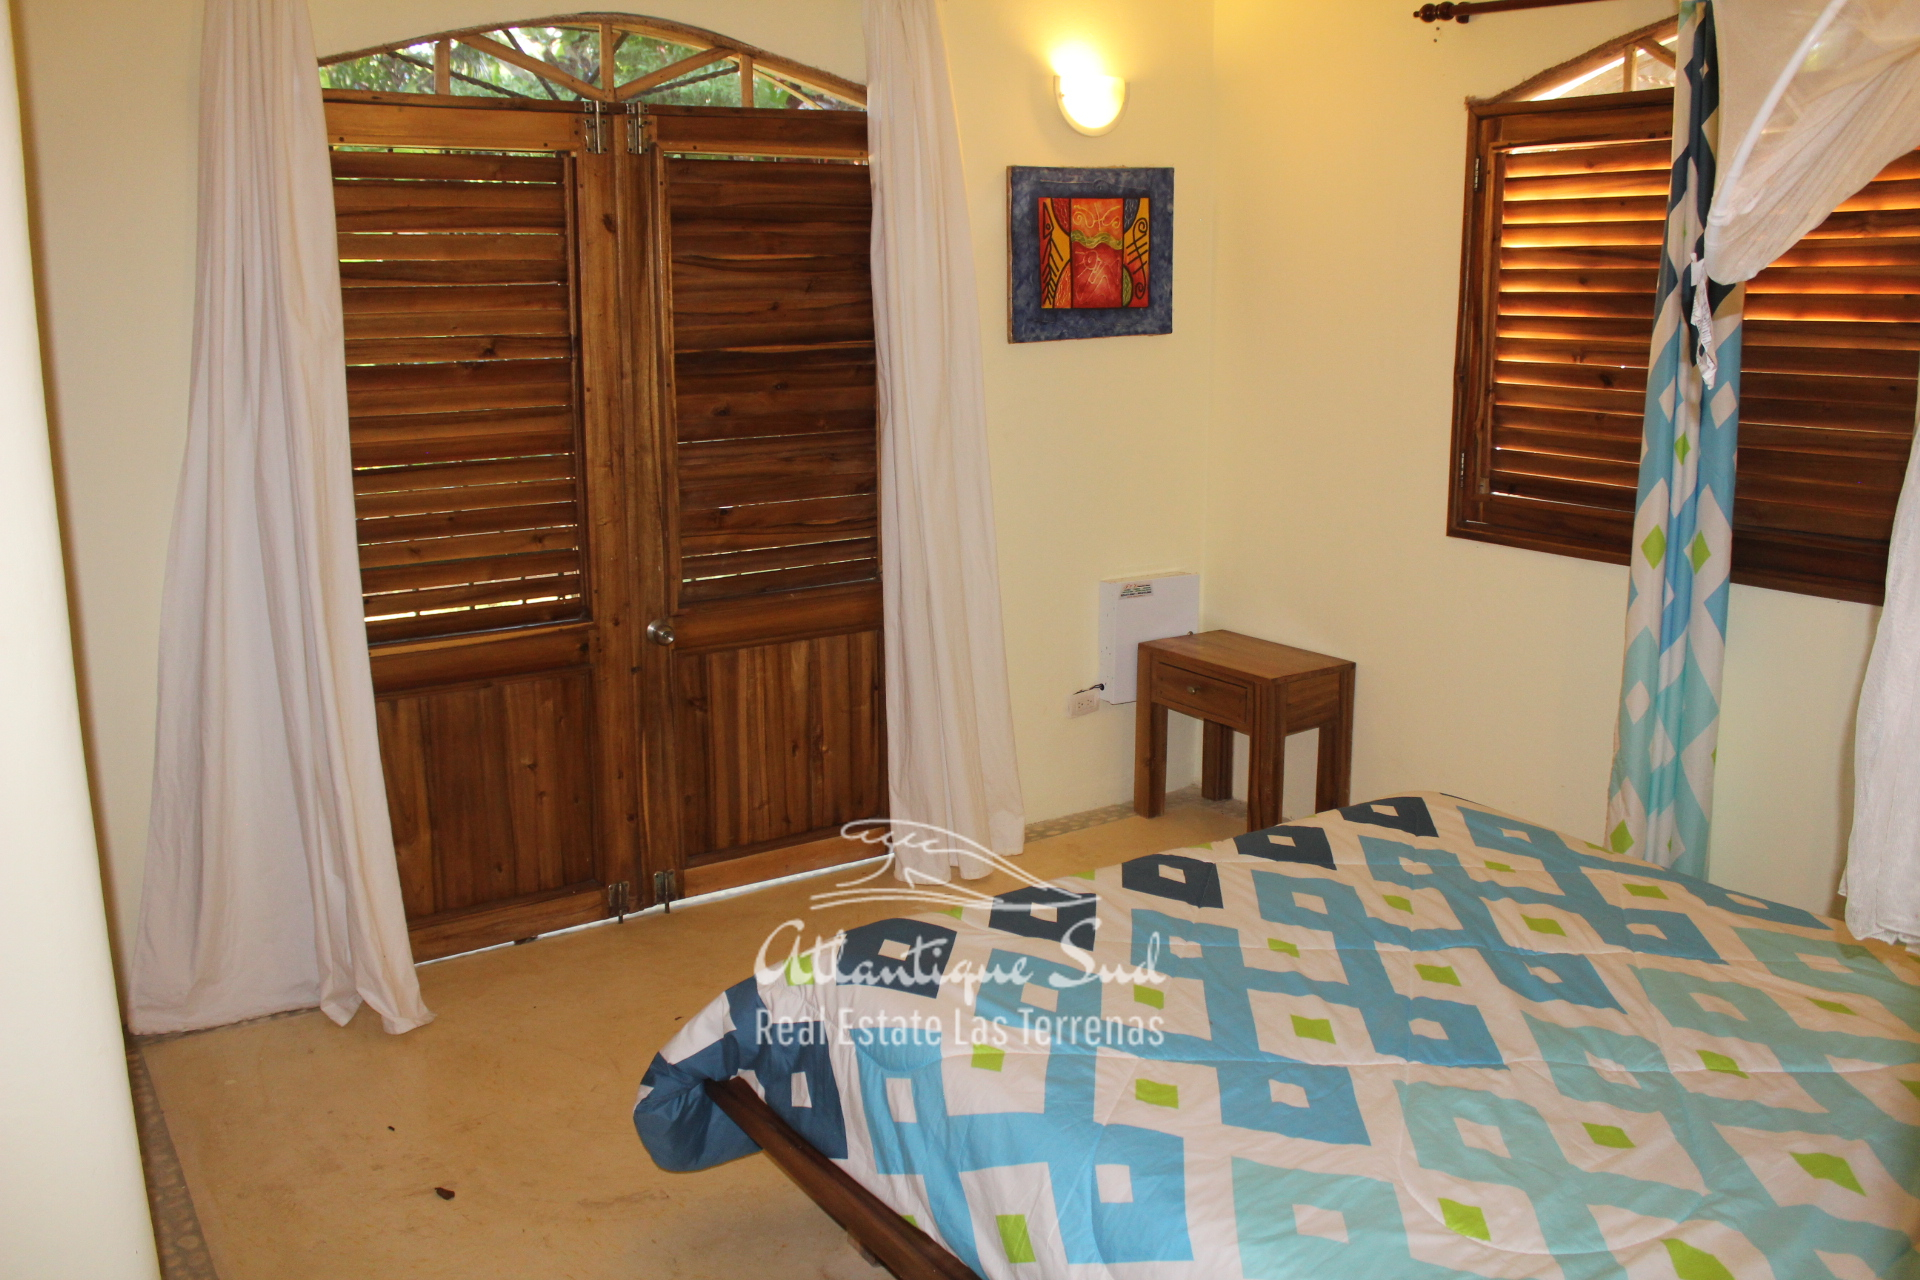 2 carribean villas minutes to the beach Real Estate Las Terrenas Dominican Republic Atlantique Sud16.jpg